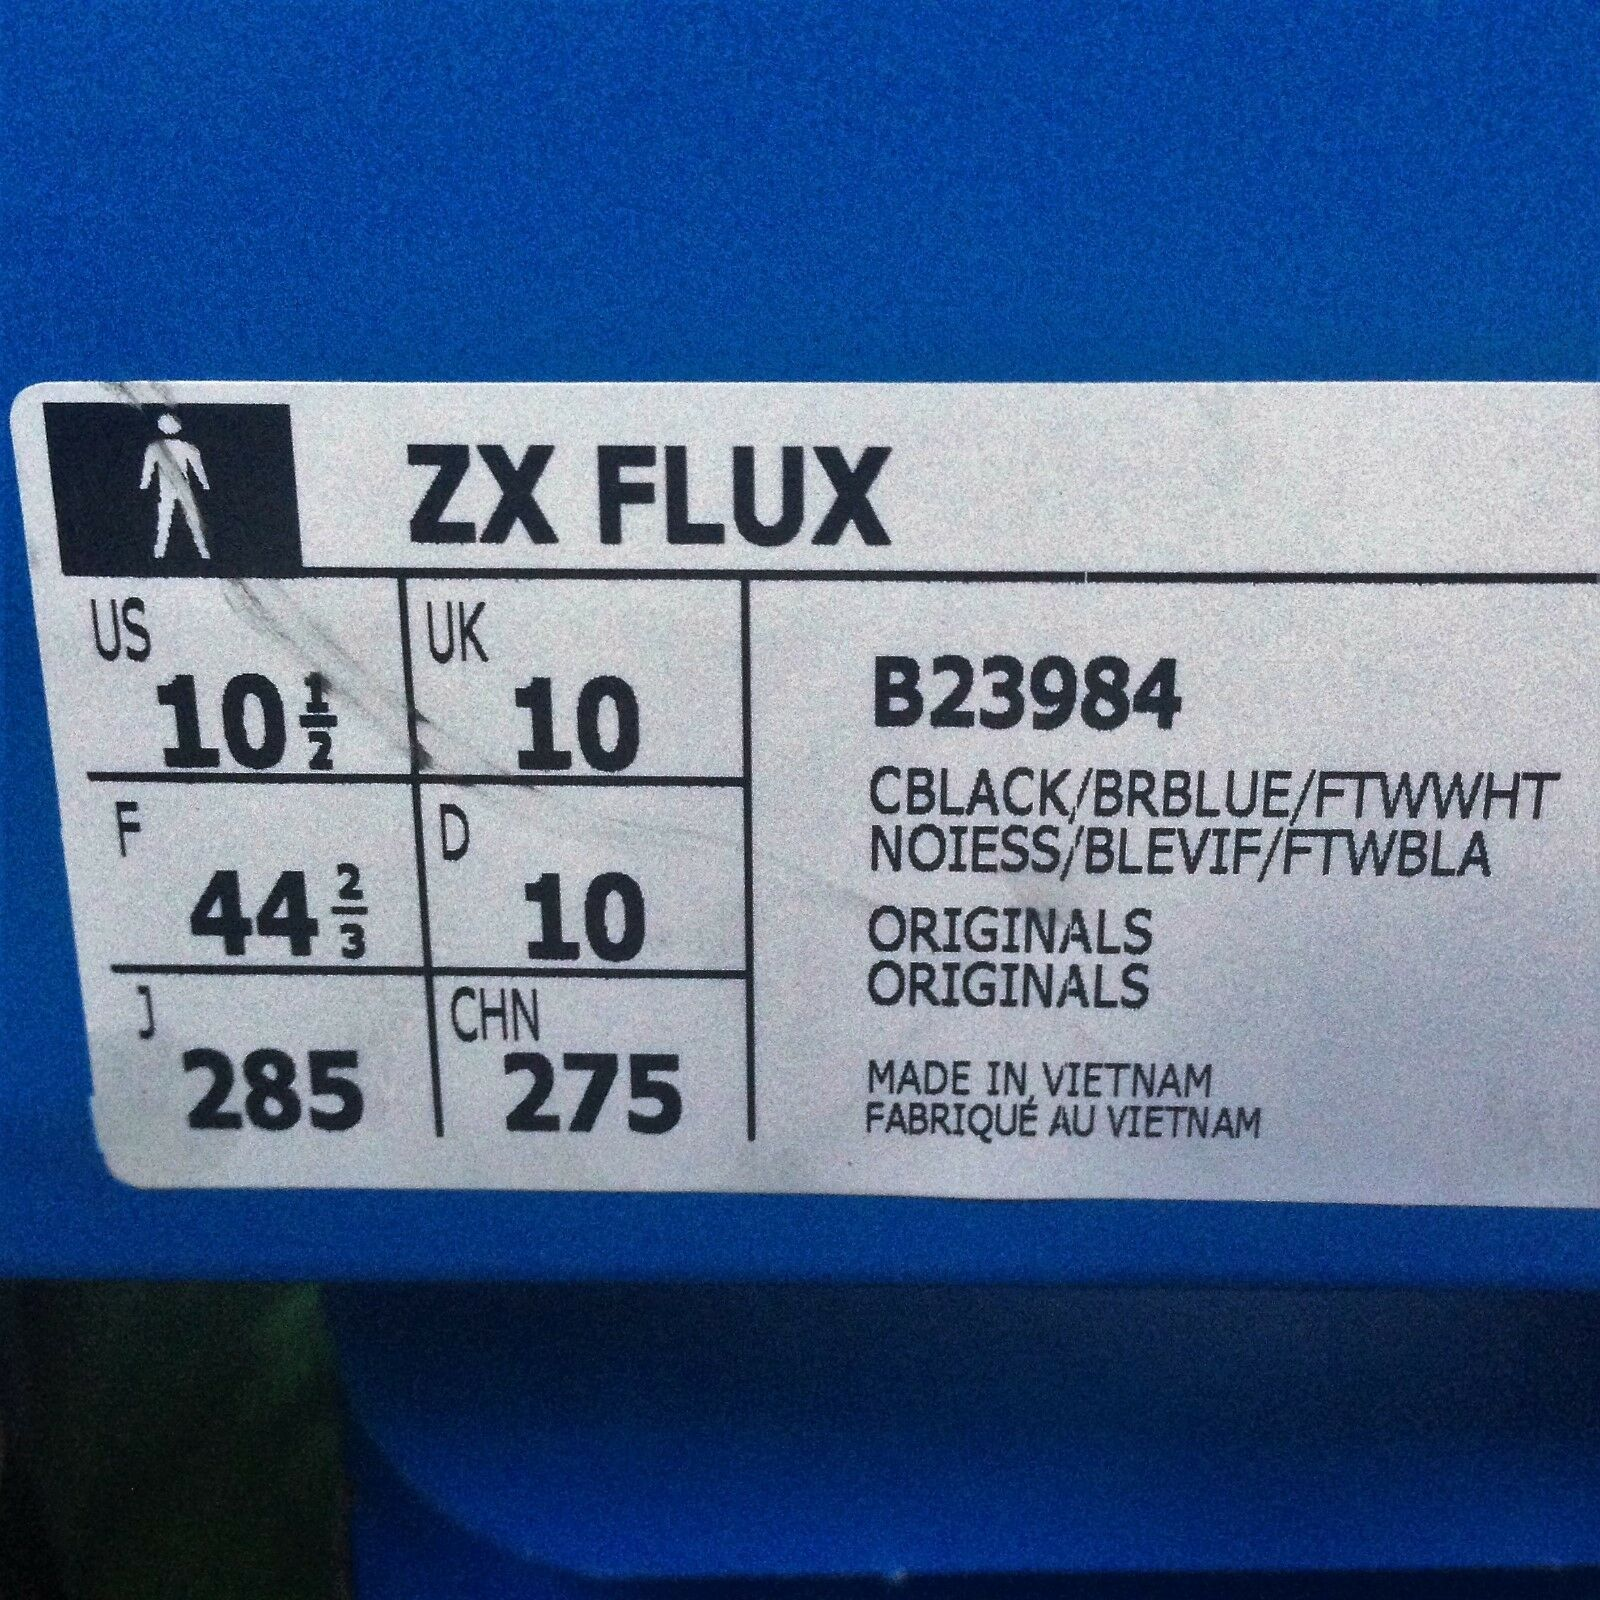 ADIDAS ZX FLUX BNIB BLK/BLUE/WH/MULTI SIZE 10.5 10.5 10.5 5e1fd6